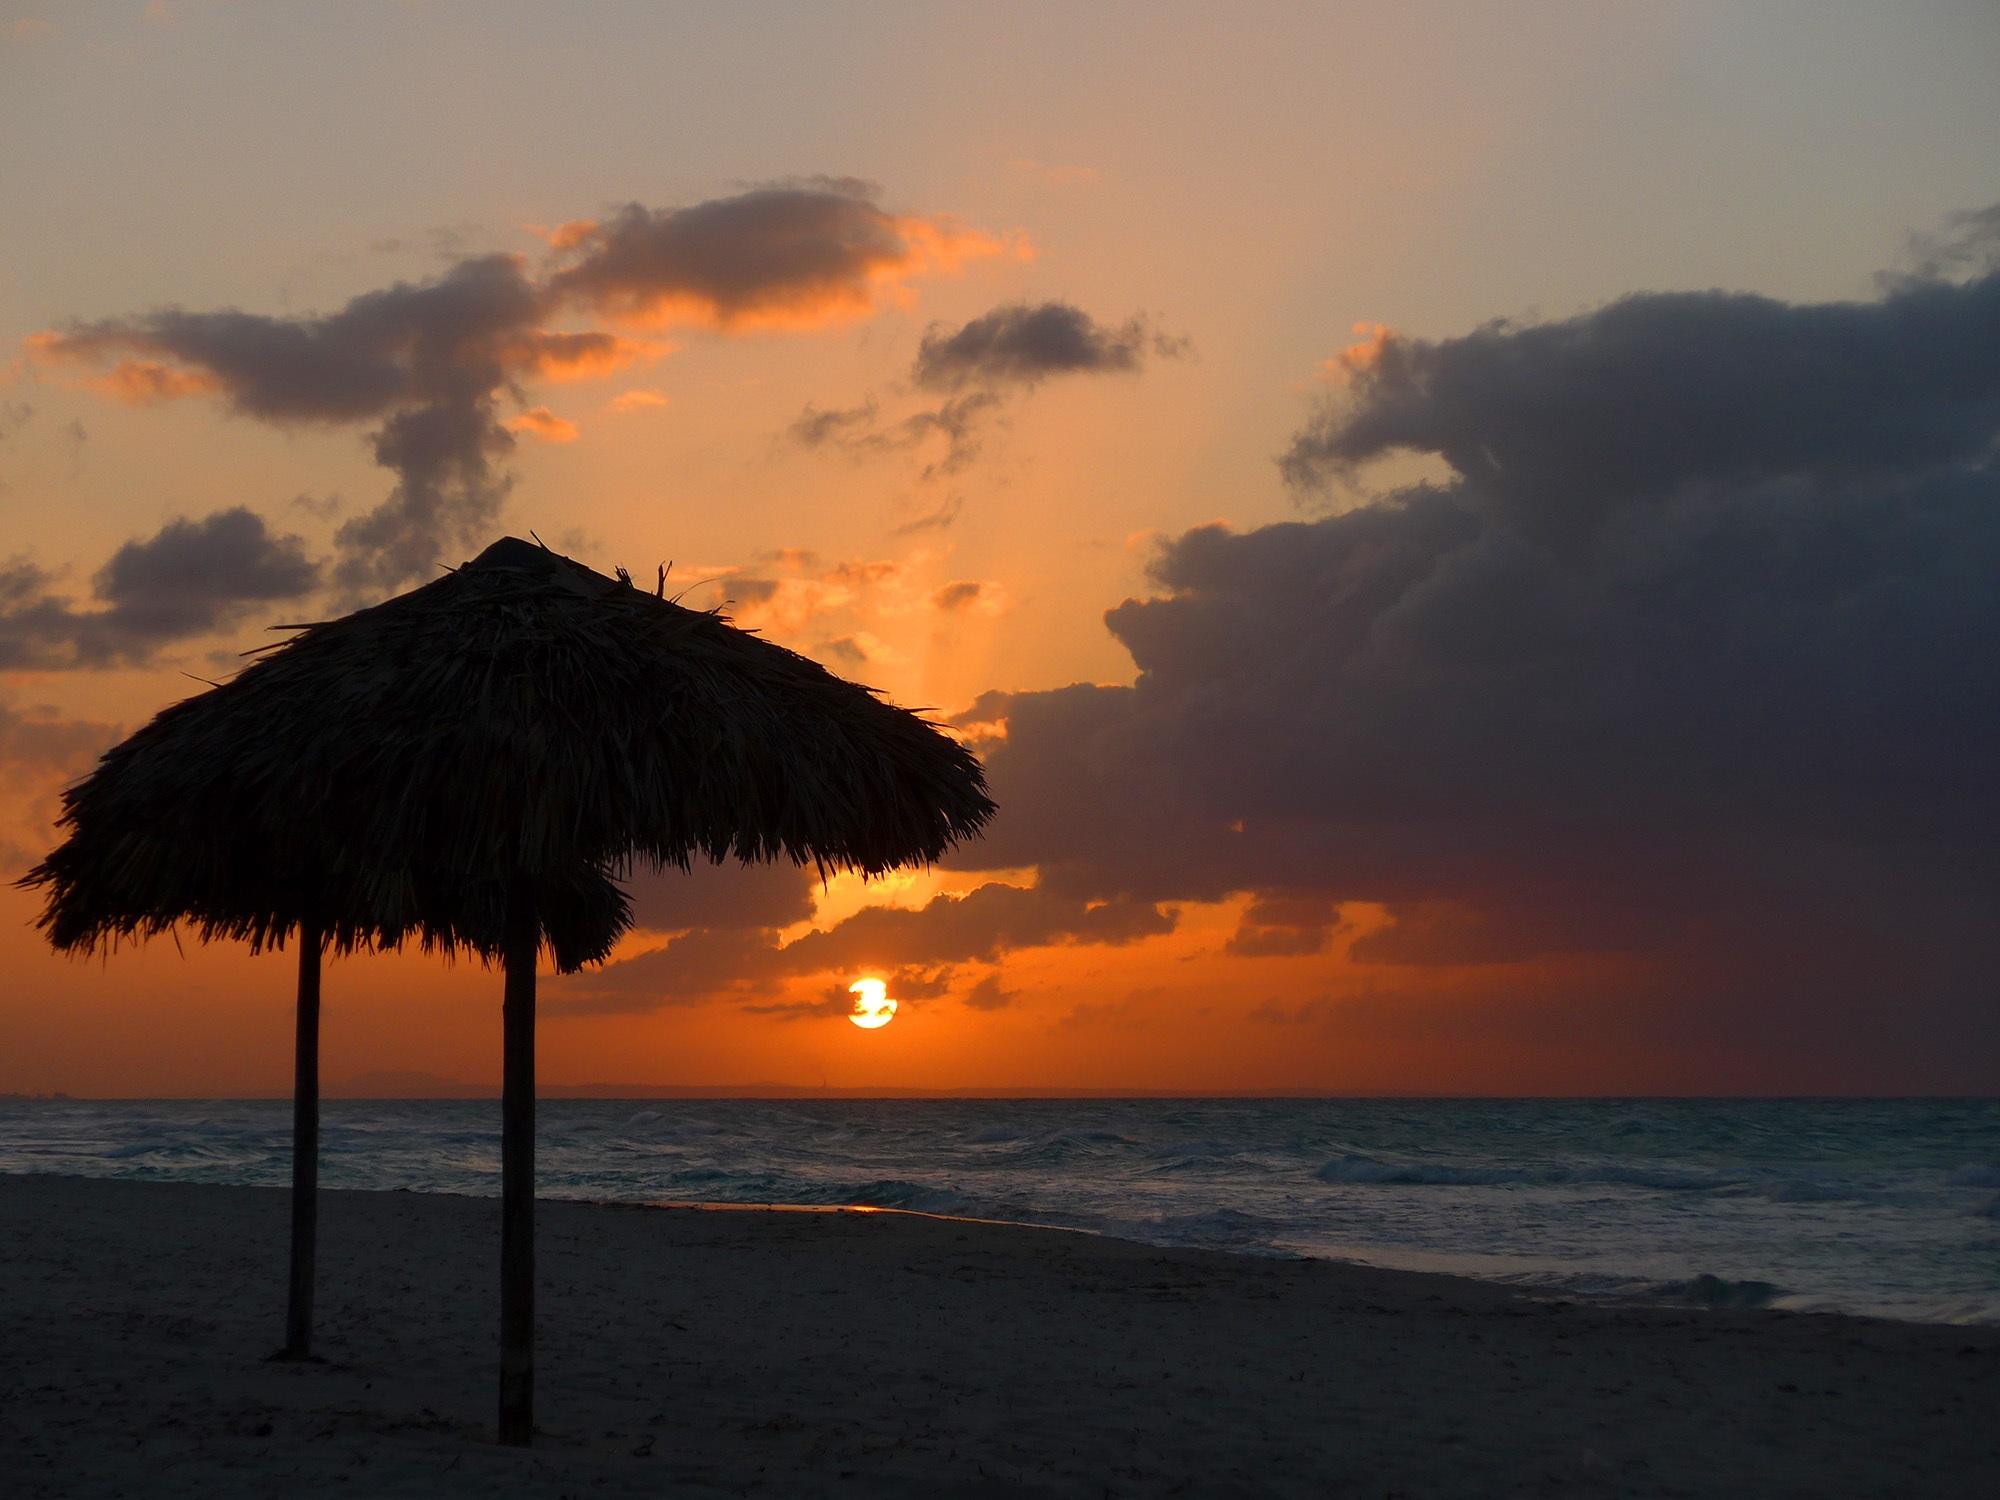 Beach Sand Clouds Sea Caribbean Water Peaceful: Free Images : Screen, Sea, Coast, Ocean, Horizon, Cloud